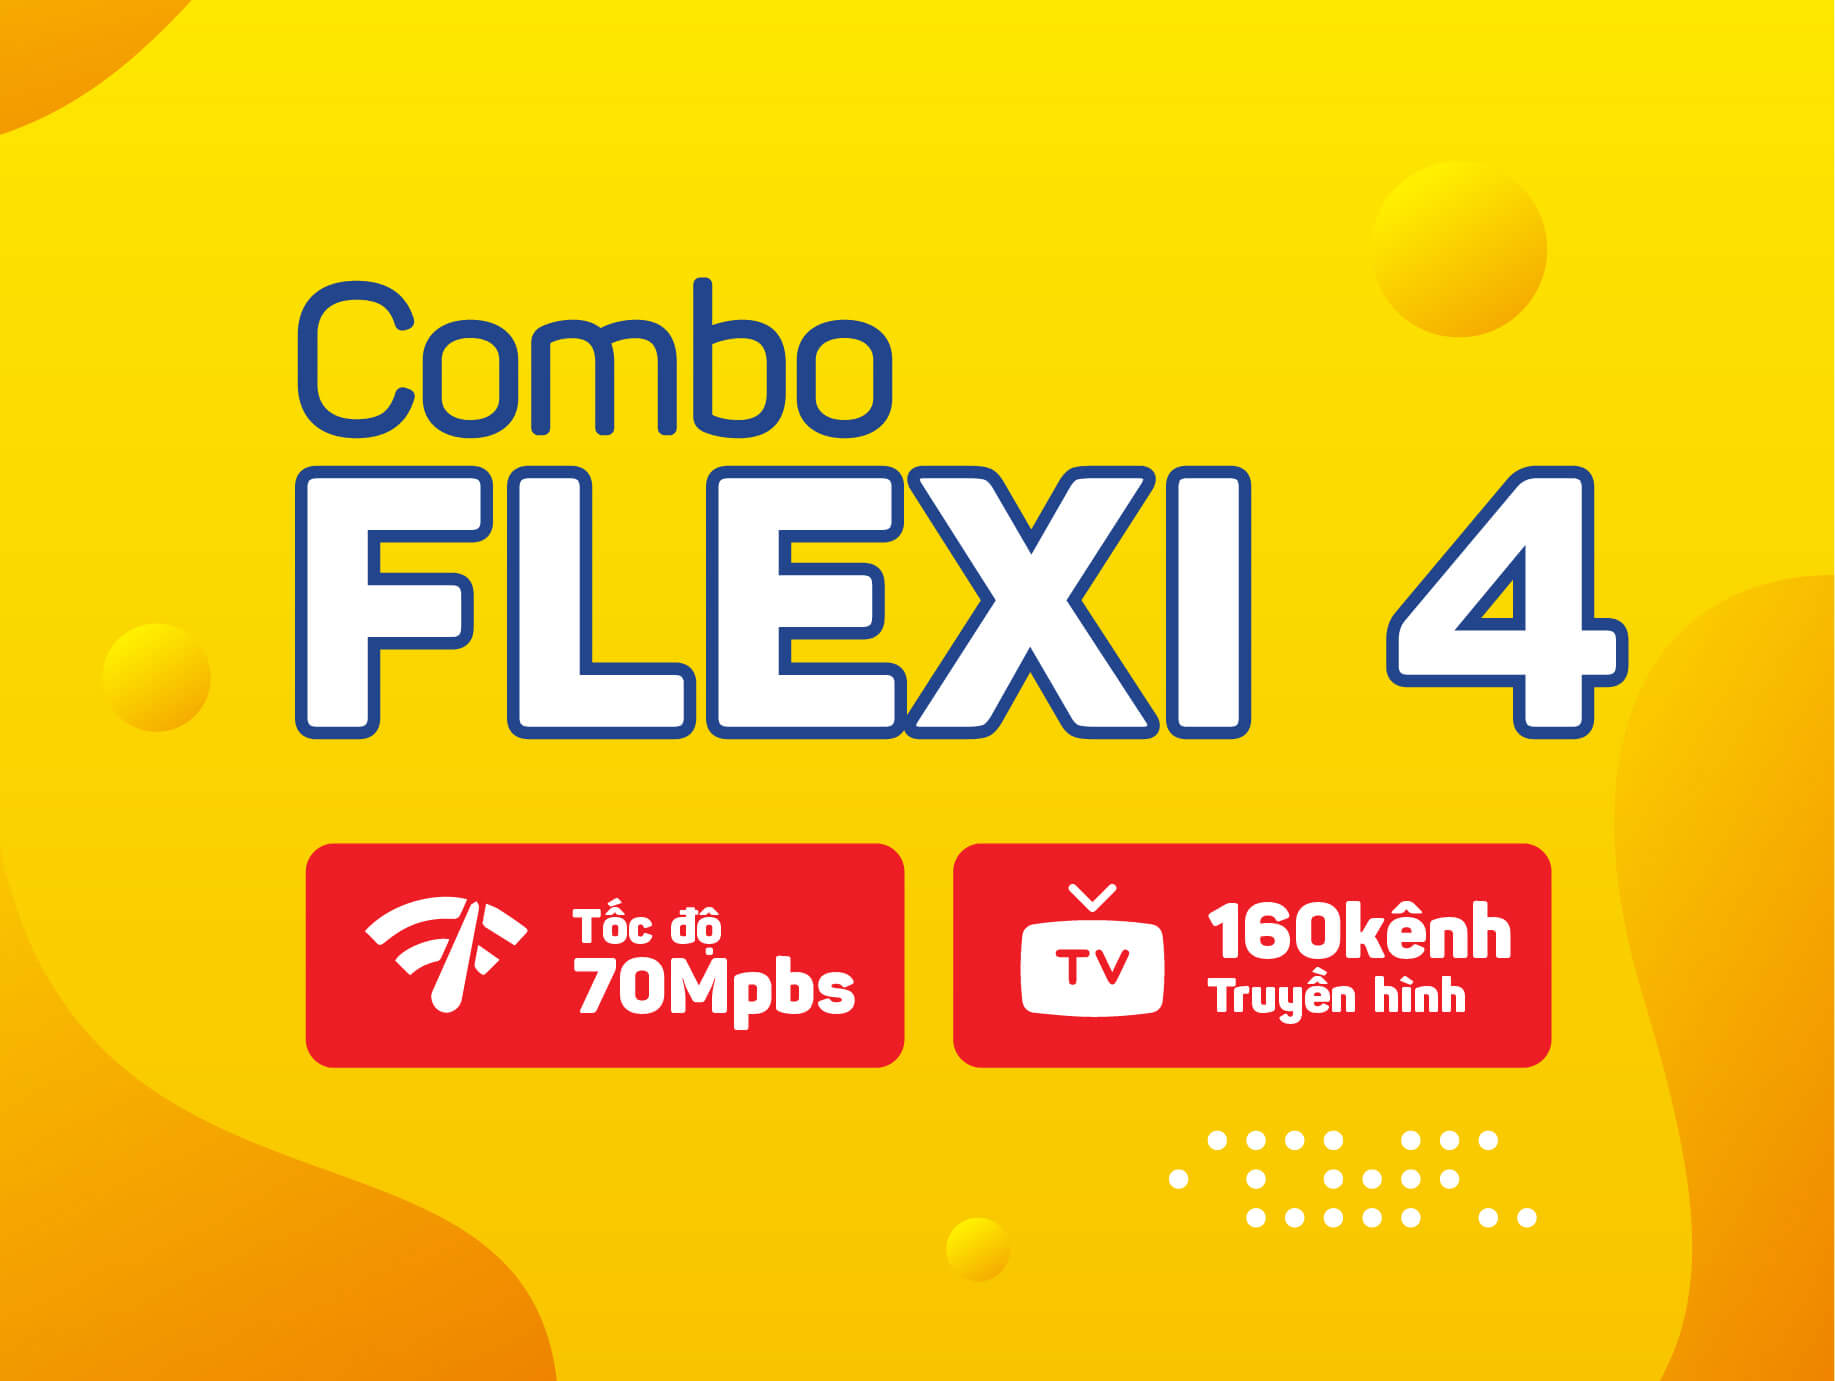 Combo internet truyền hình Flexi 4